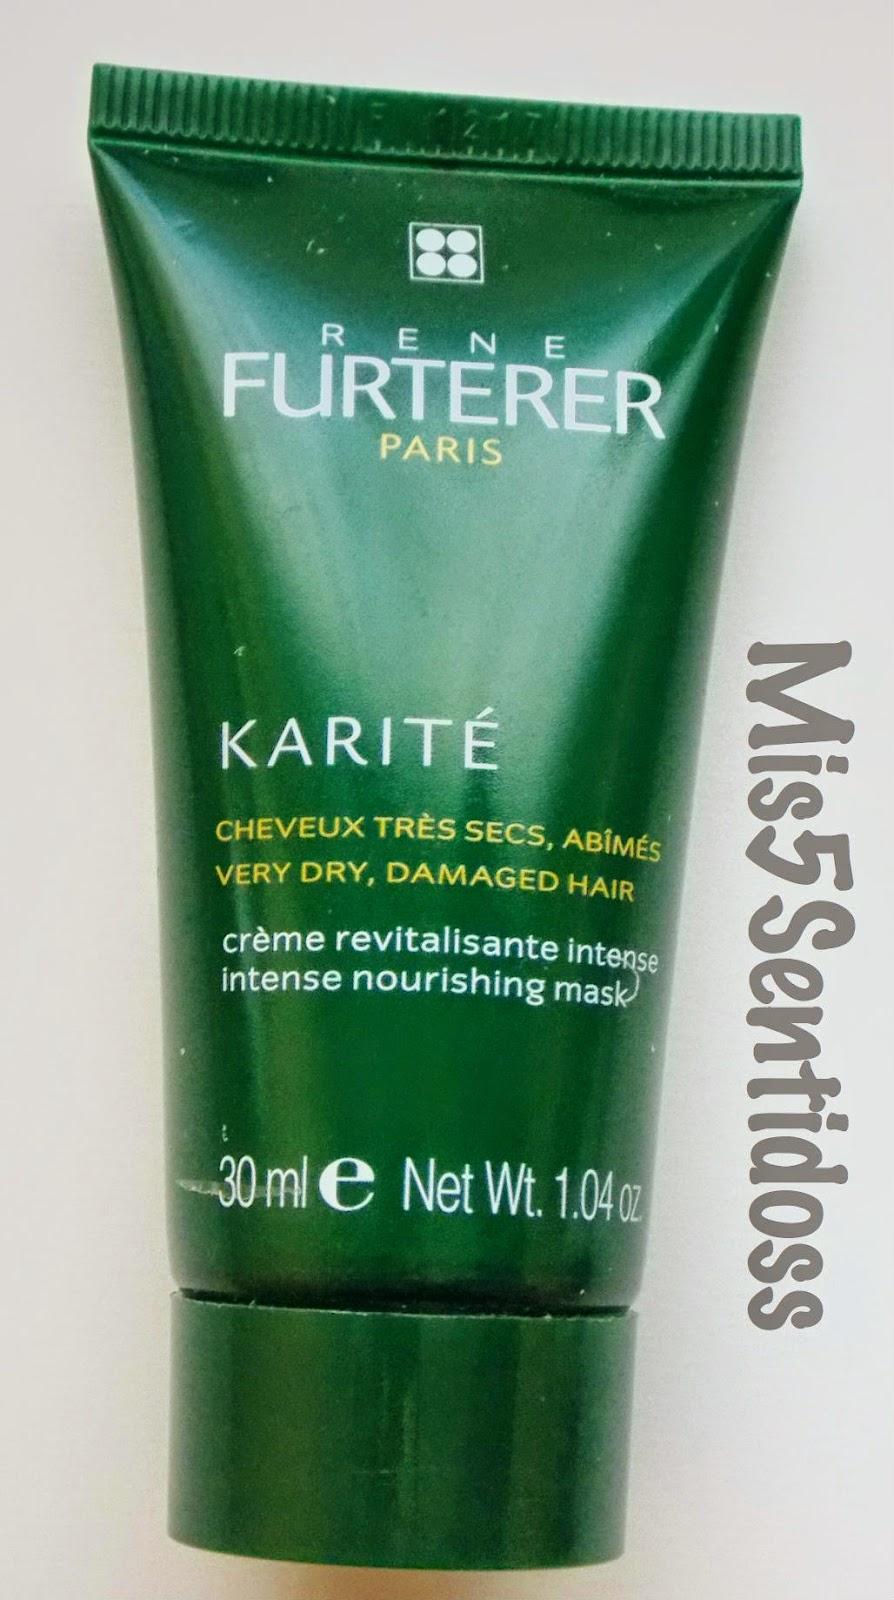 Rene Furterer Mascarilla revitalizante de Karité